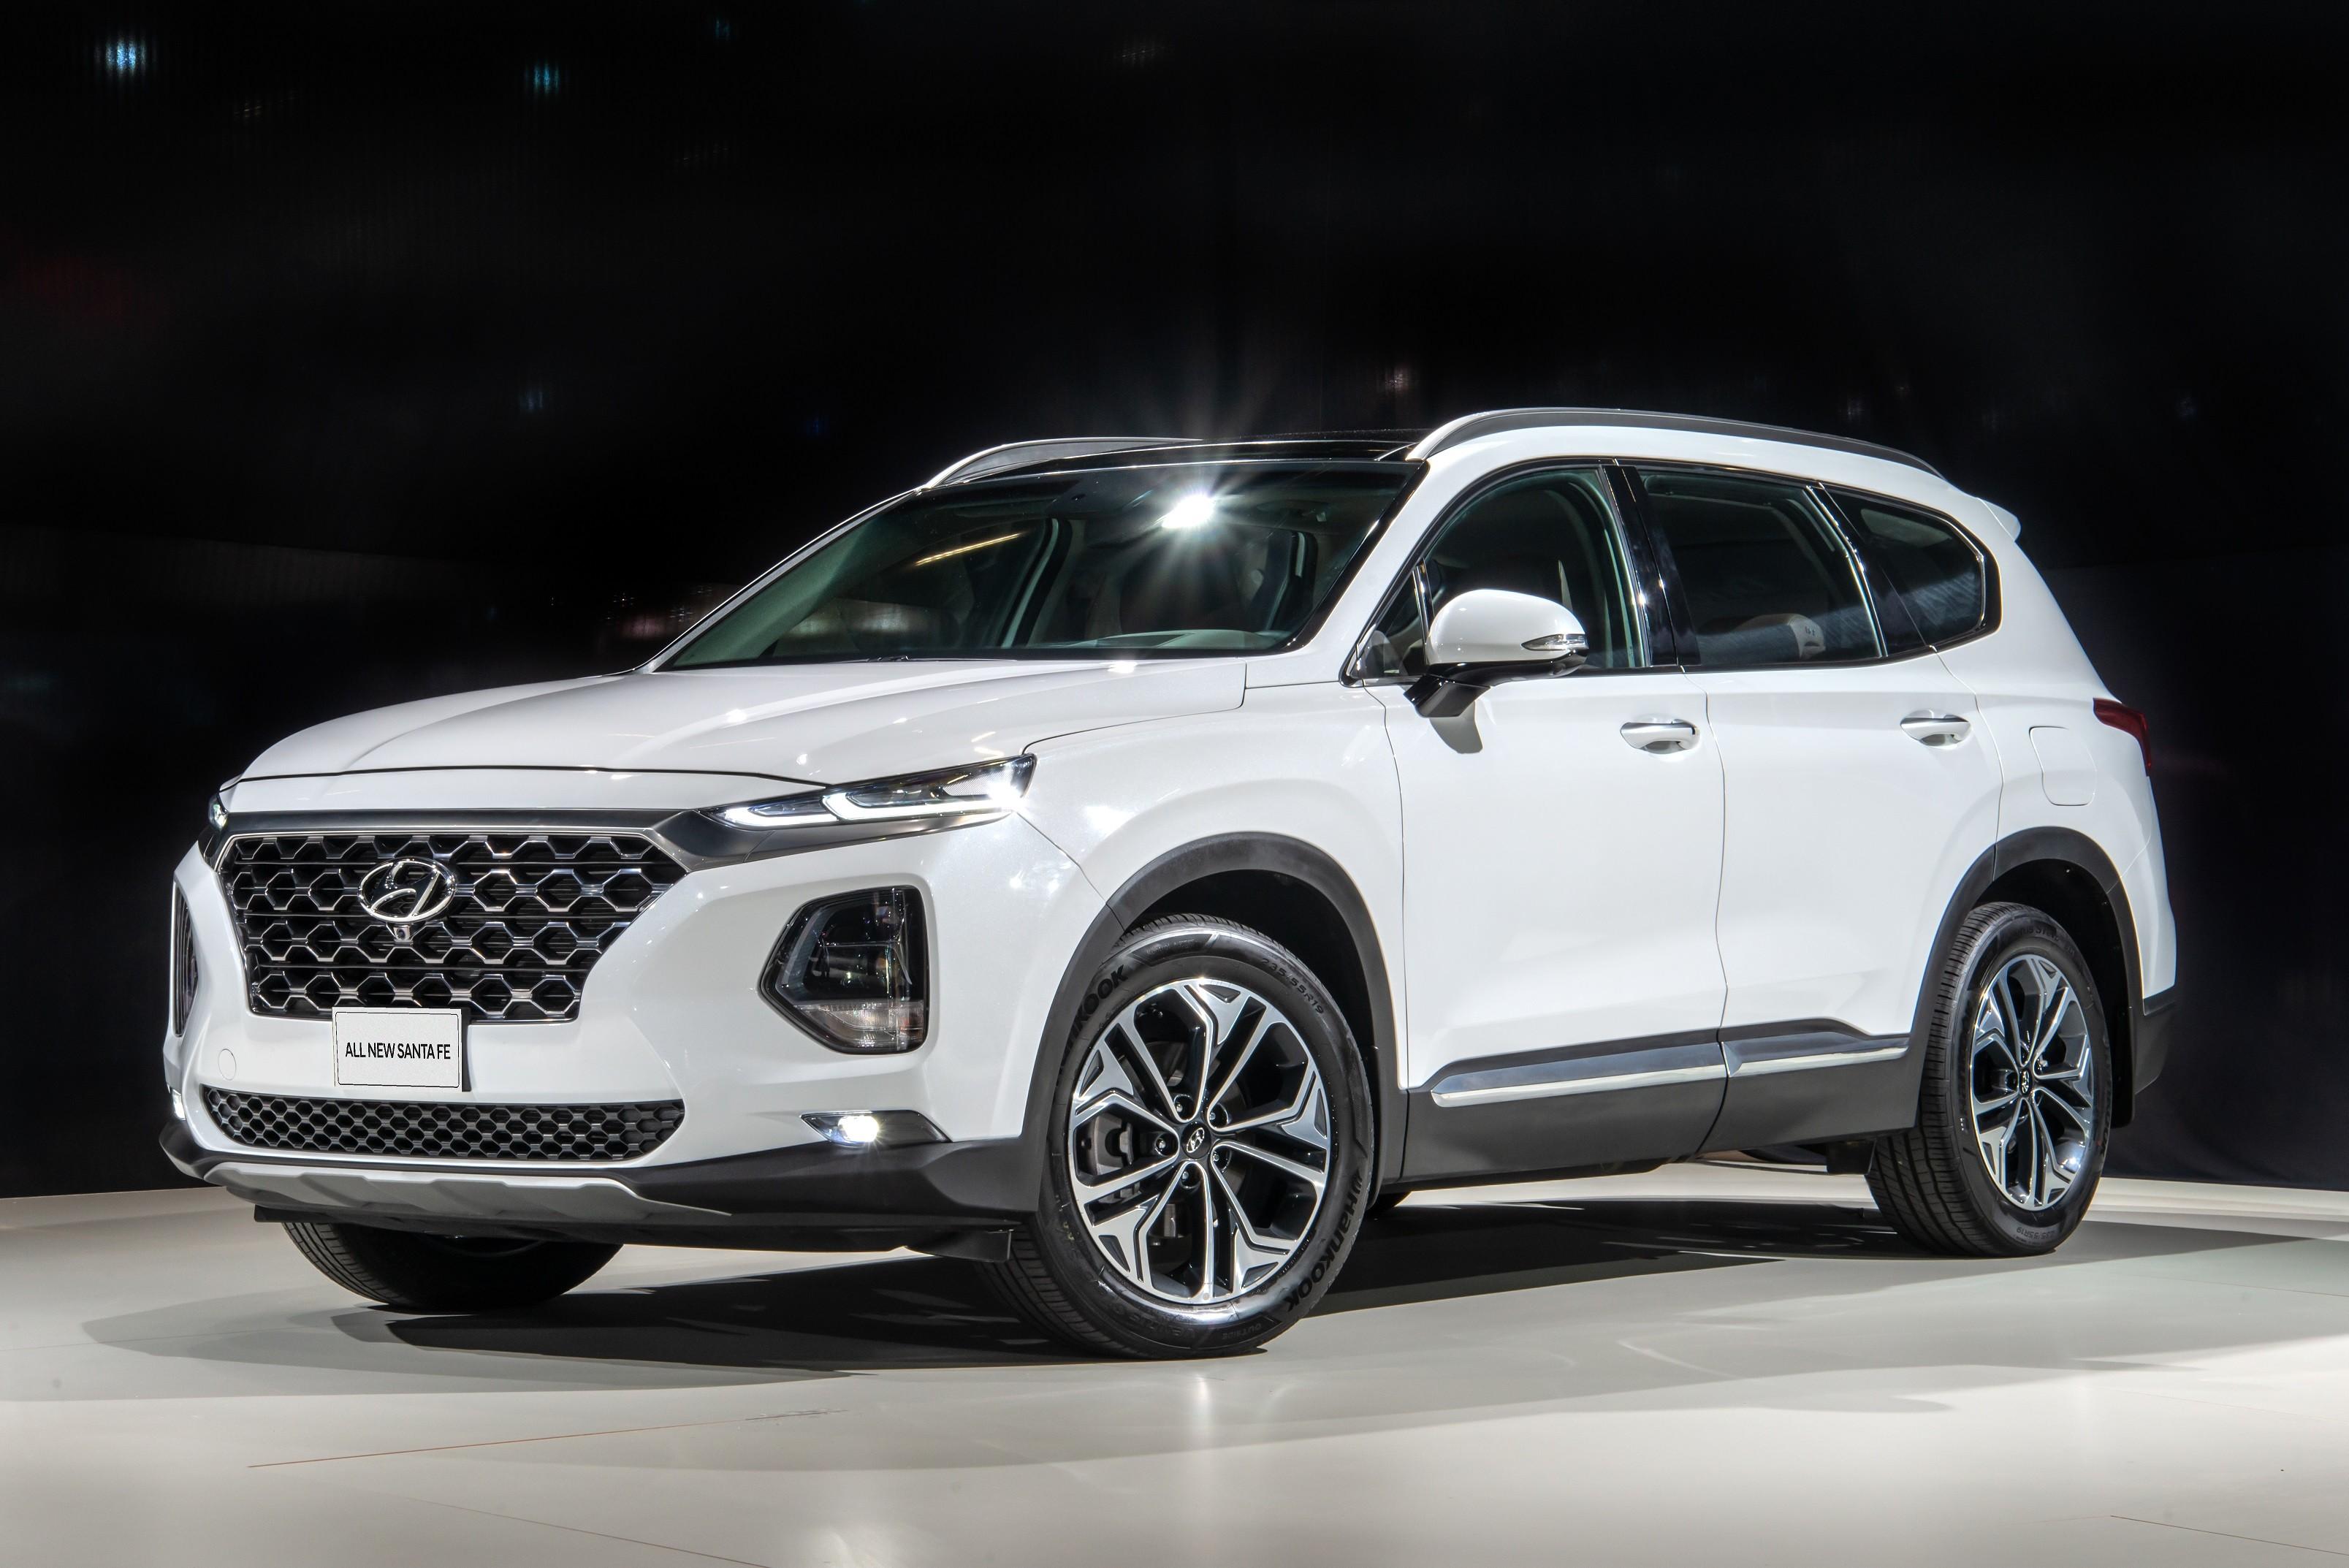 Novo Hyundai Santa Fe chega ao Brasil por R$ 297,3 mil